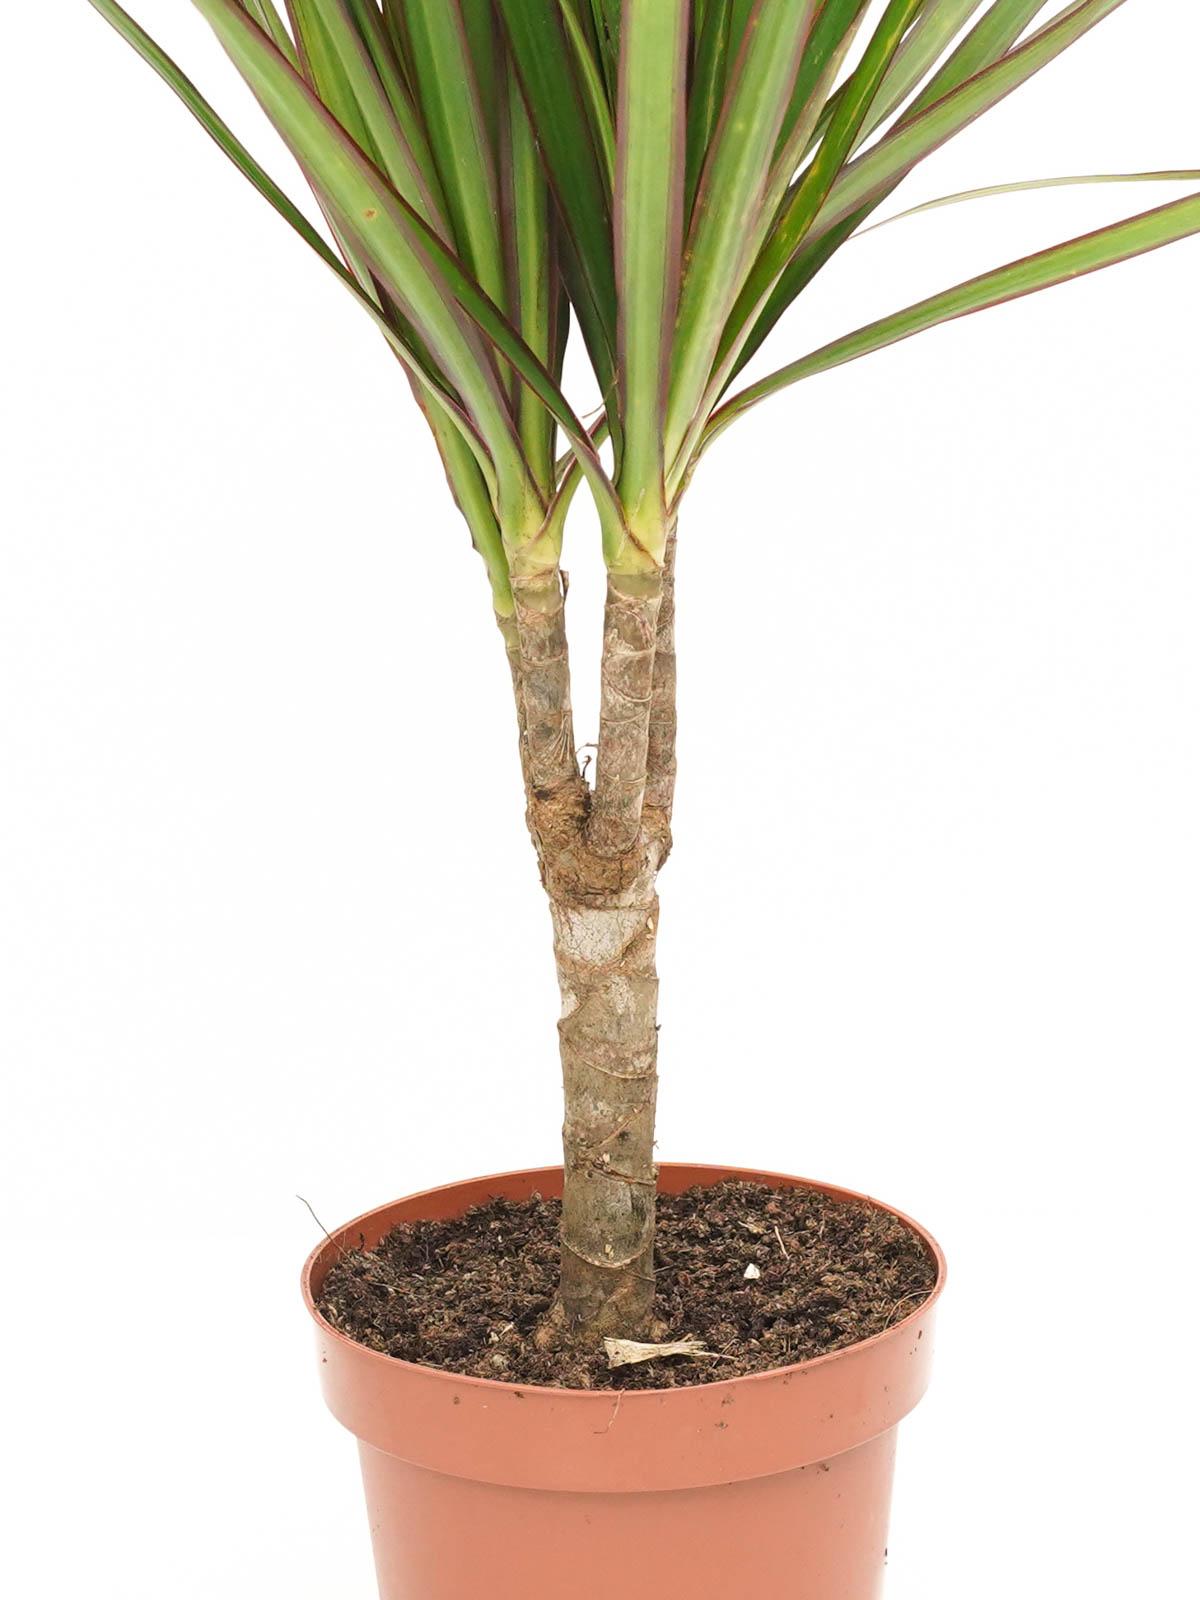 Dracaena Marginata Indoor Plants Shrubs